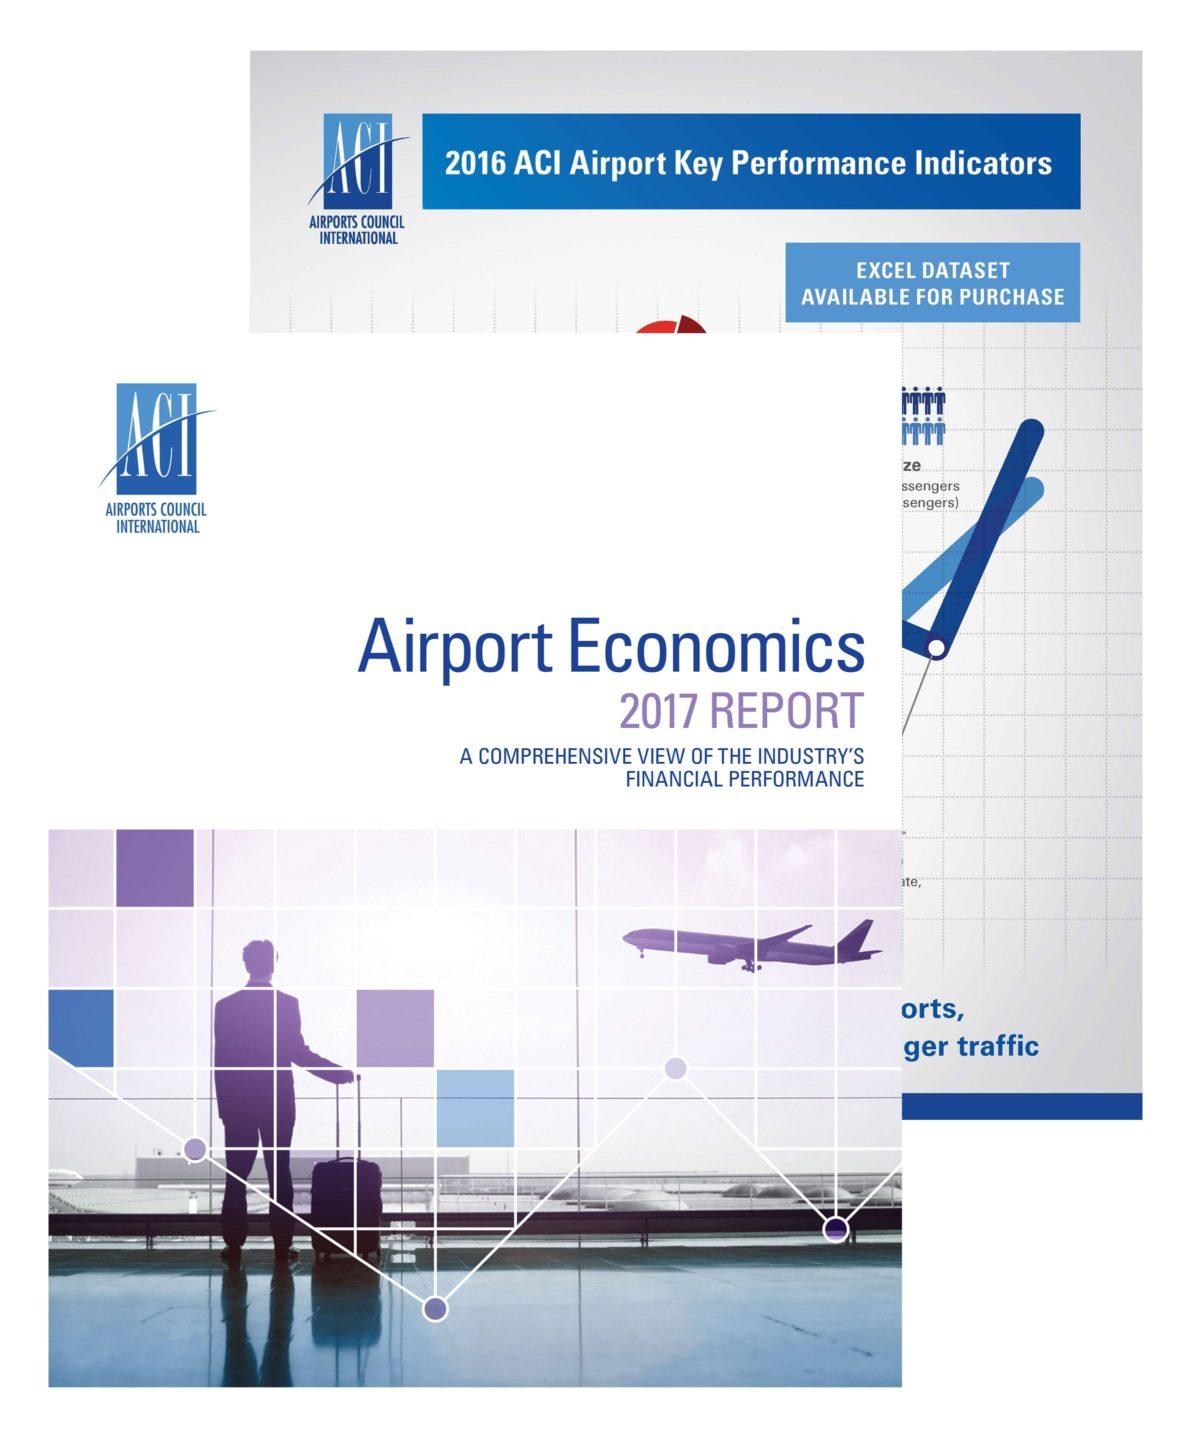 BUNDLE: 2016 KPIs + 2017 Economics Report